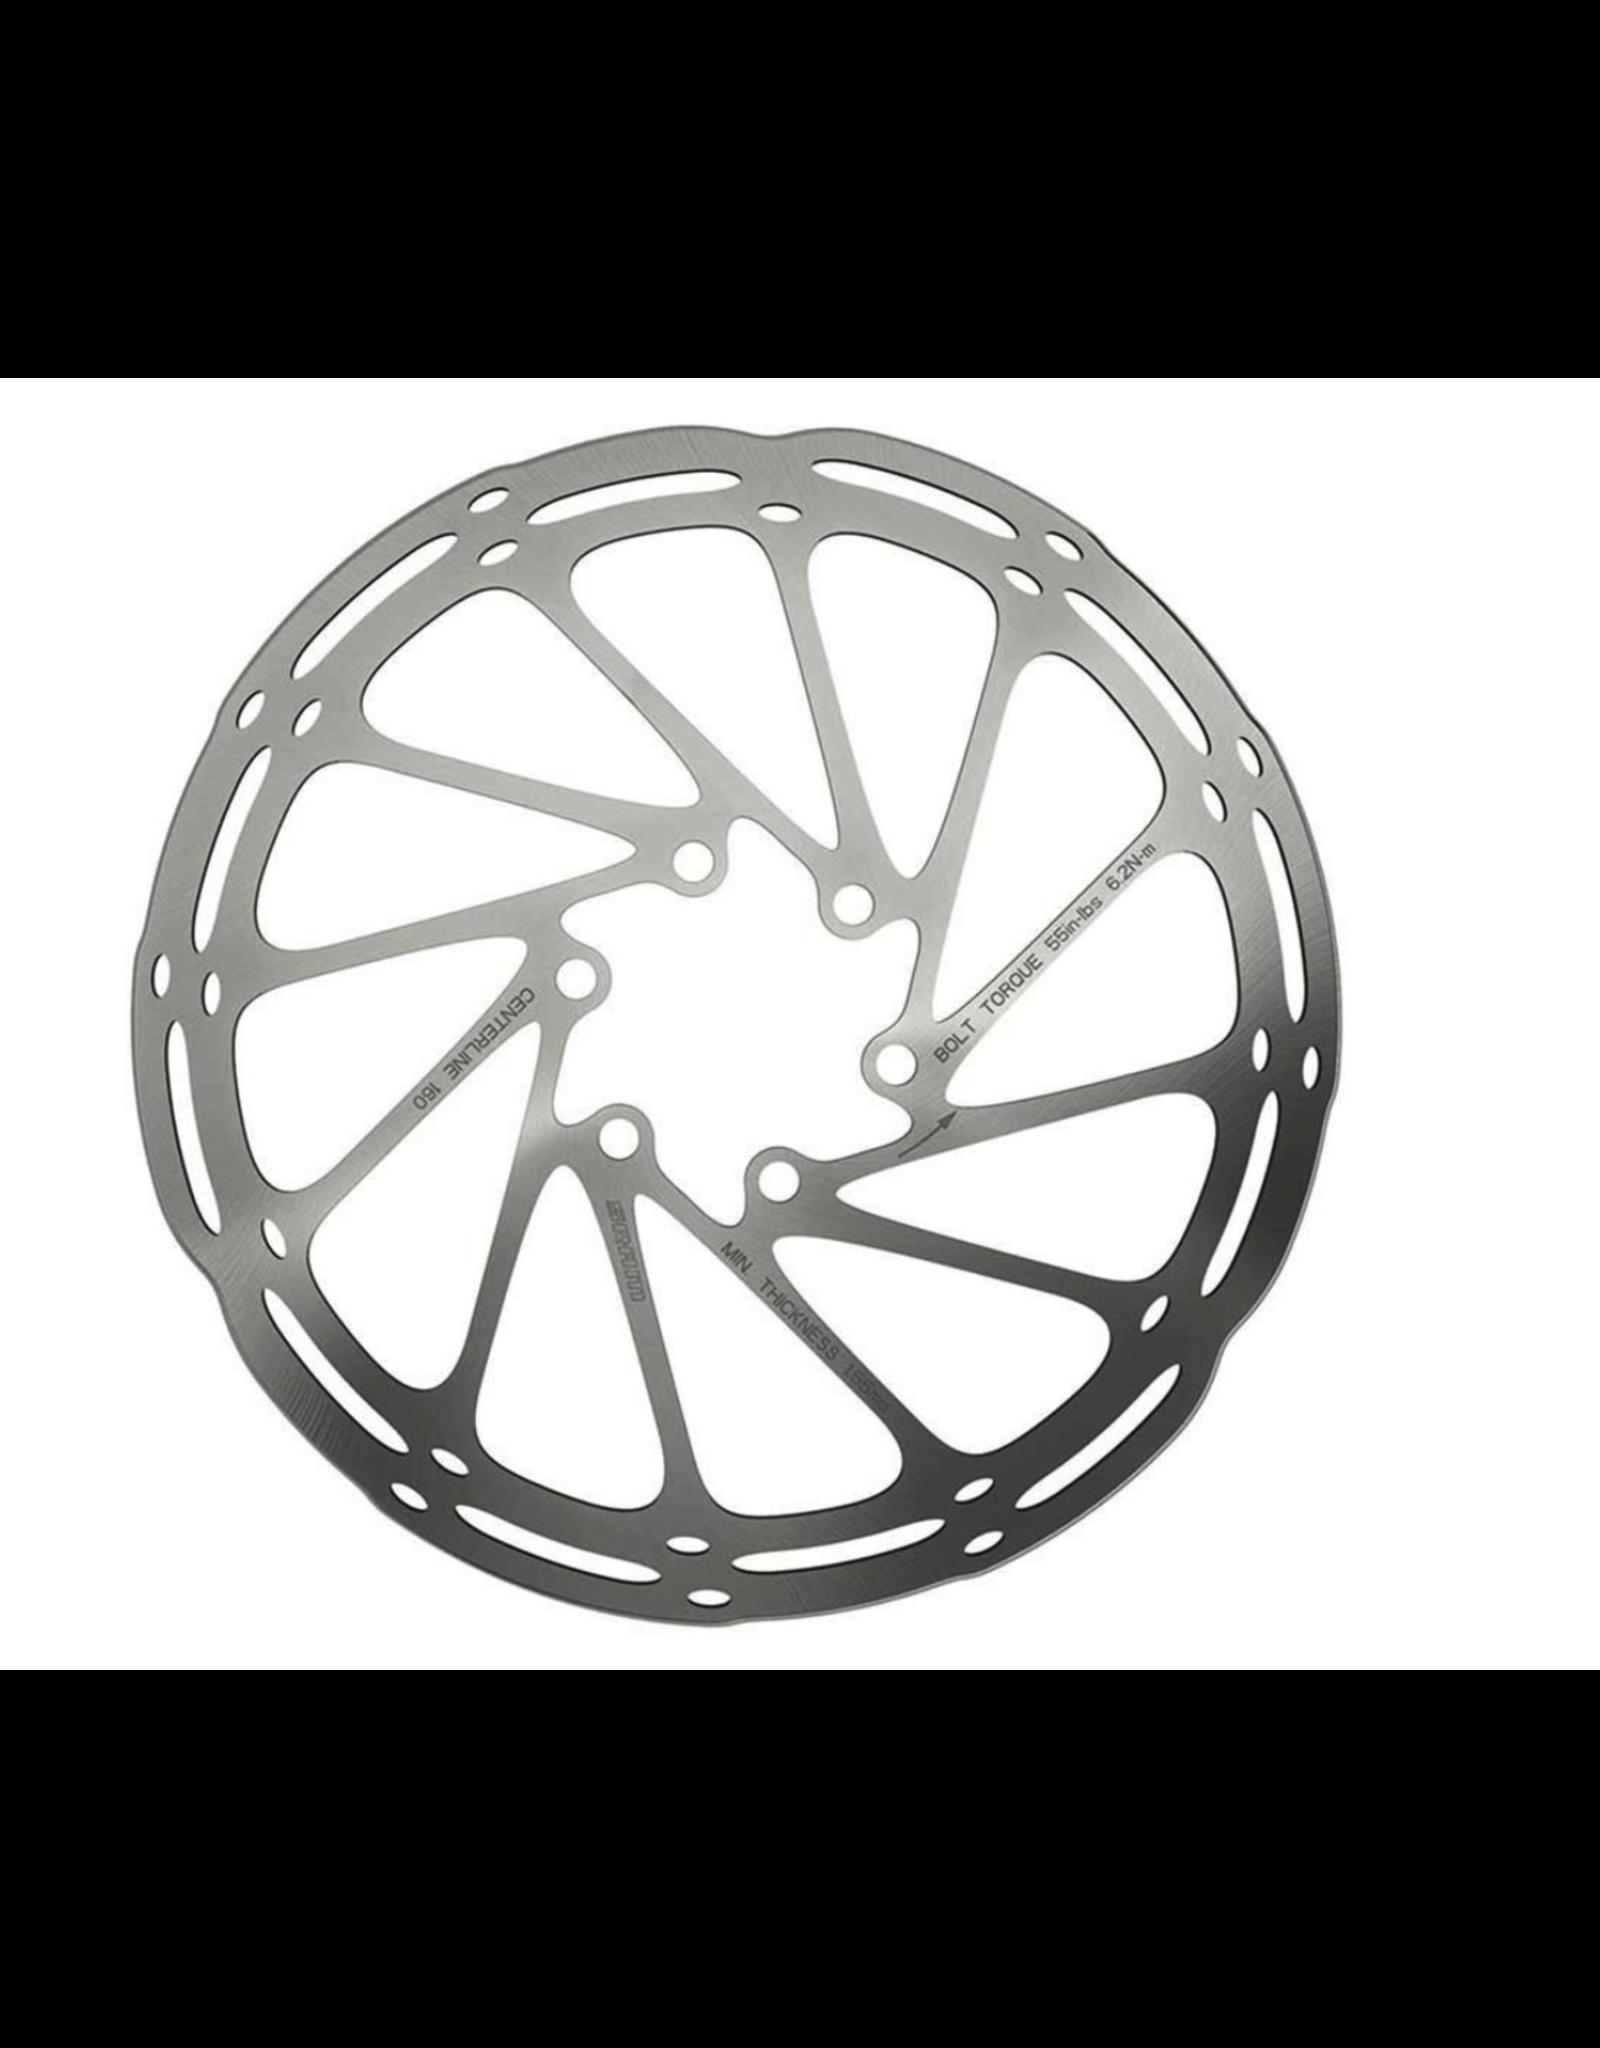 SRAM SRAM, Centerline Rounded, Disc brake rotor, IS 6B, 140mm